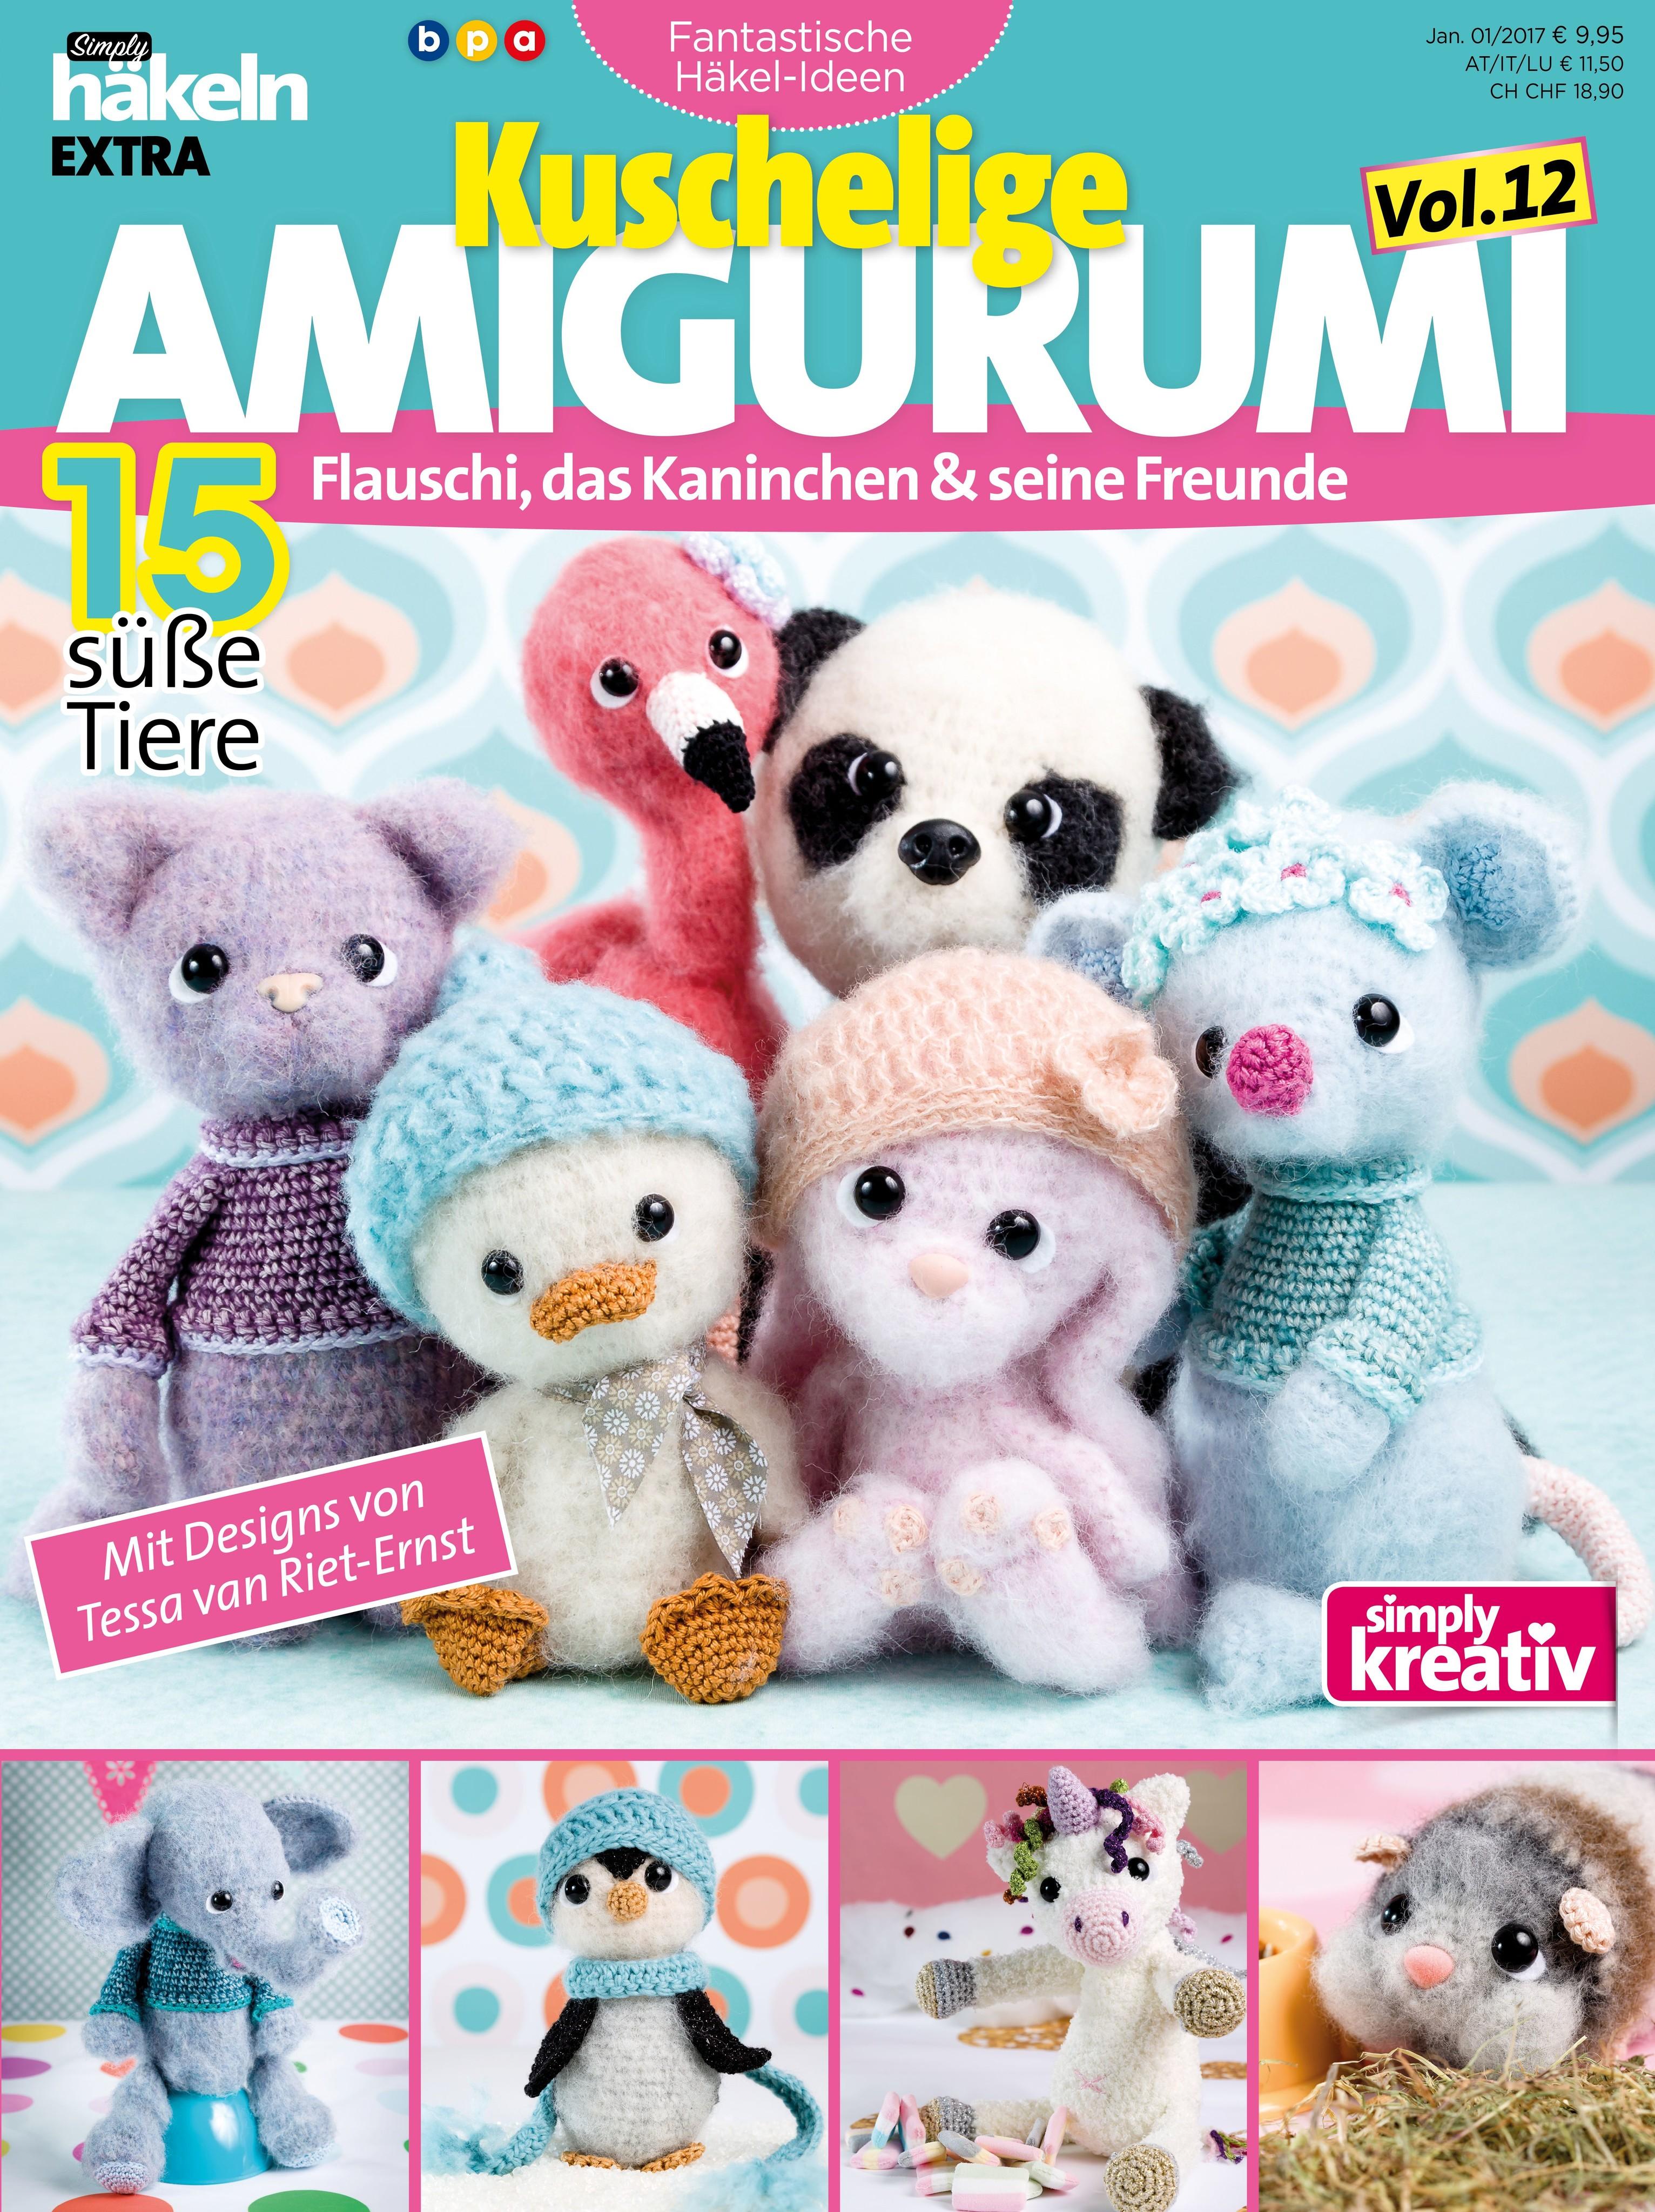 Simply Häkeln Fantastische Häkel Ideen Kuschelige Amigurumi Vol